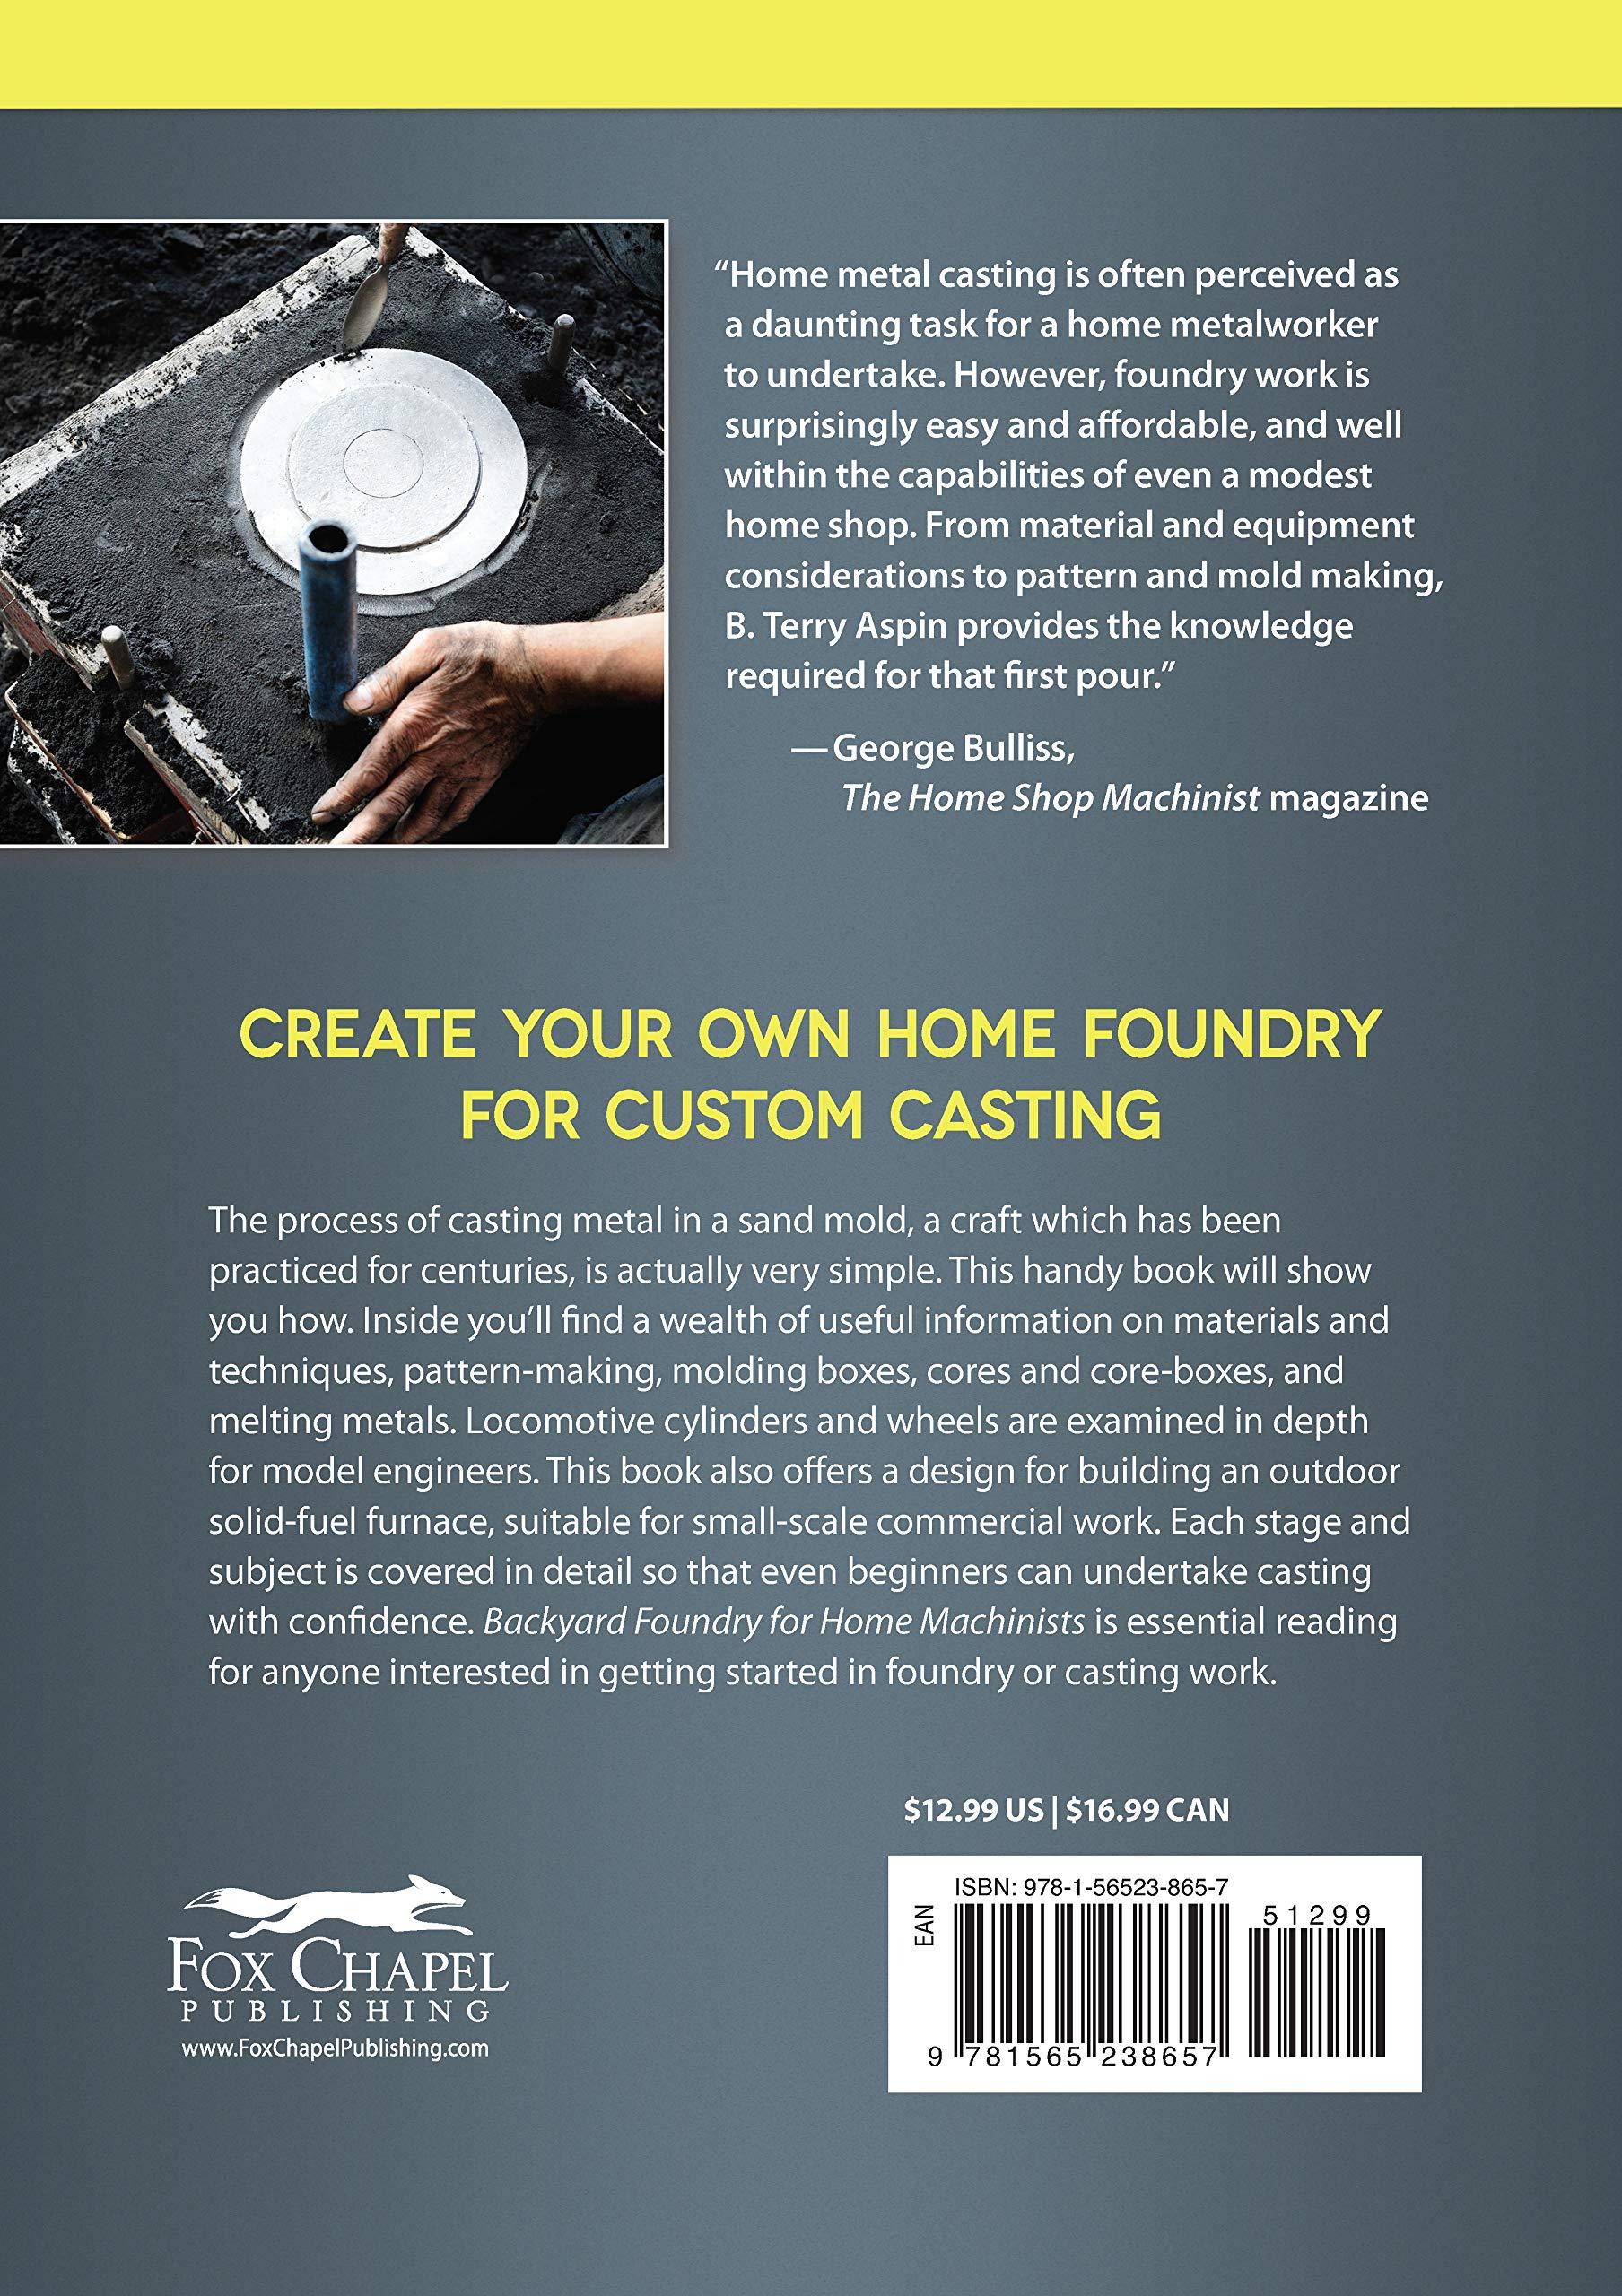 Backyard Foundry for Home Machinists (Fox Chapel Publishing) Metal